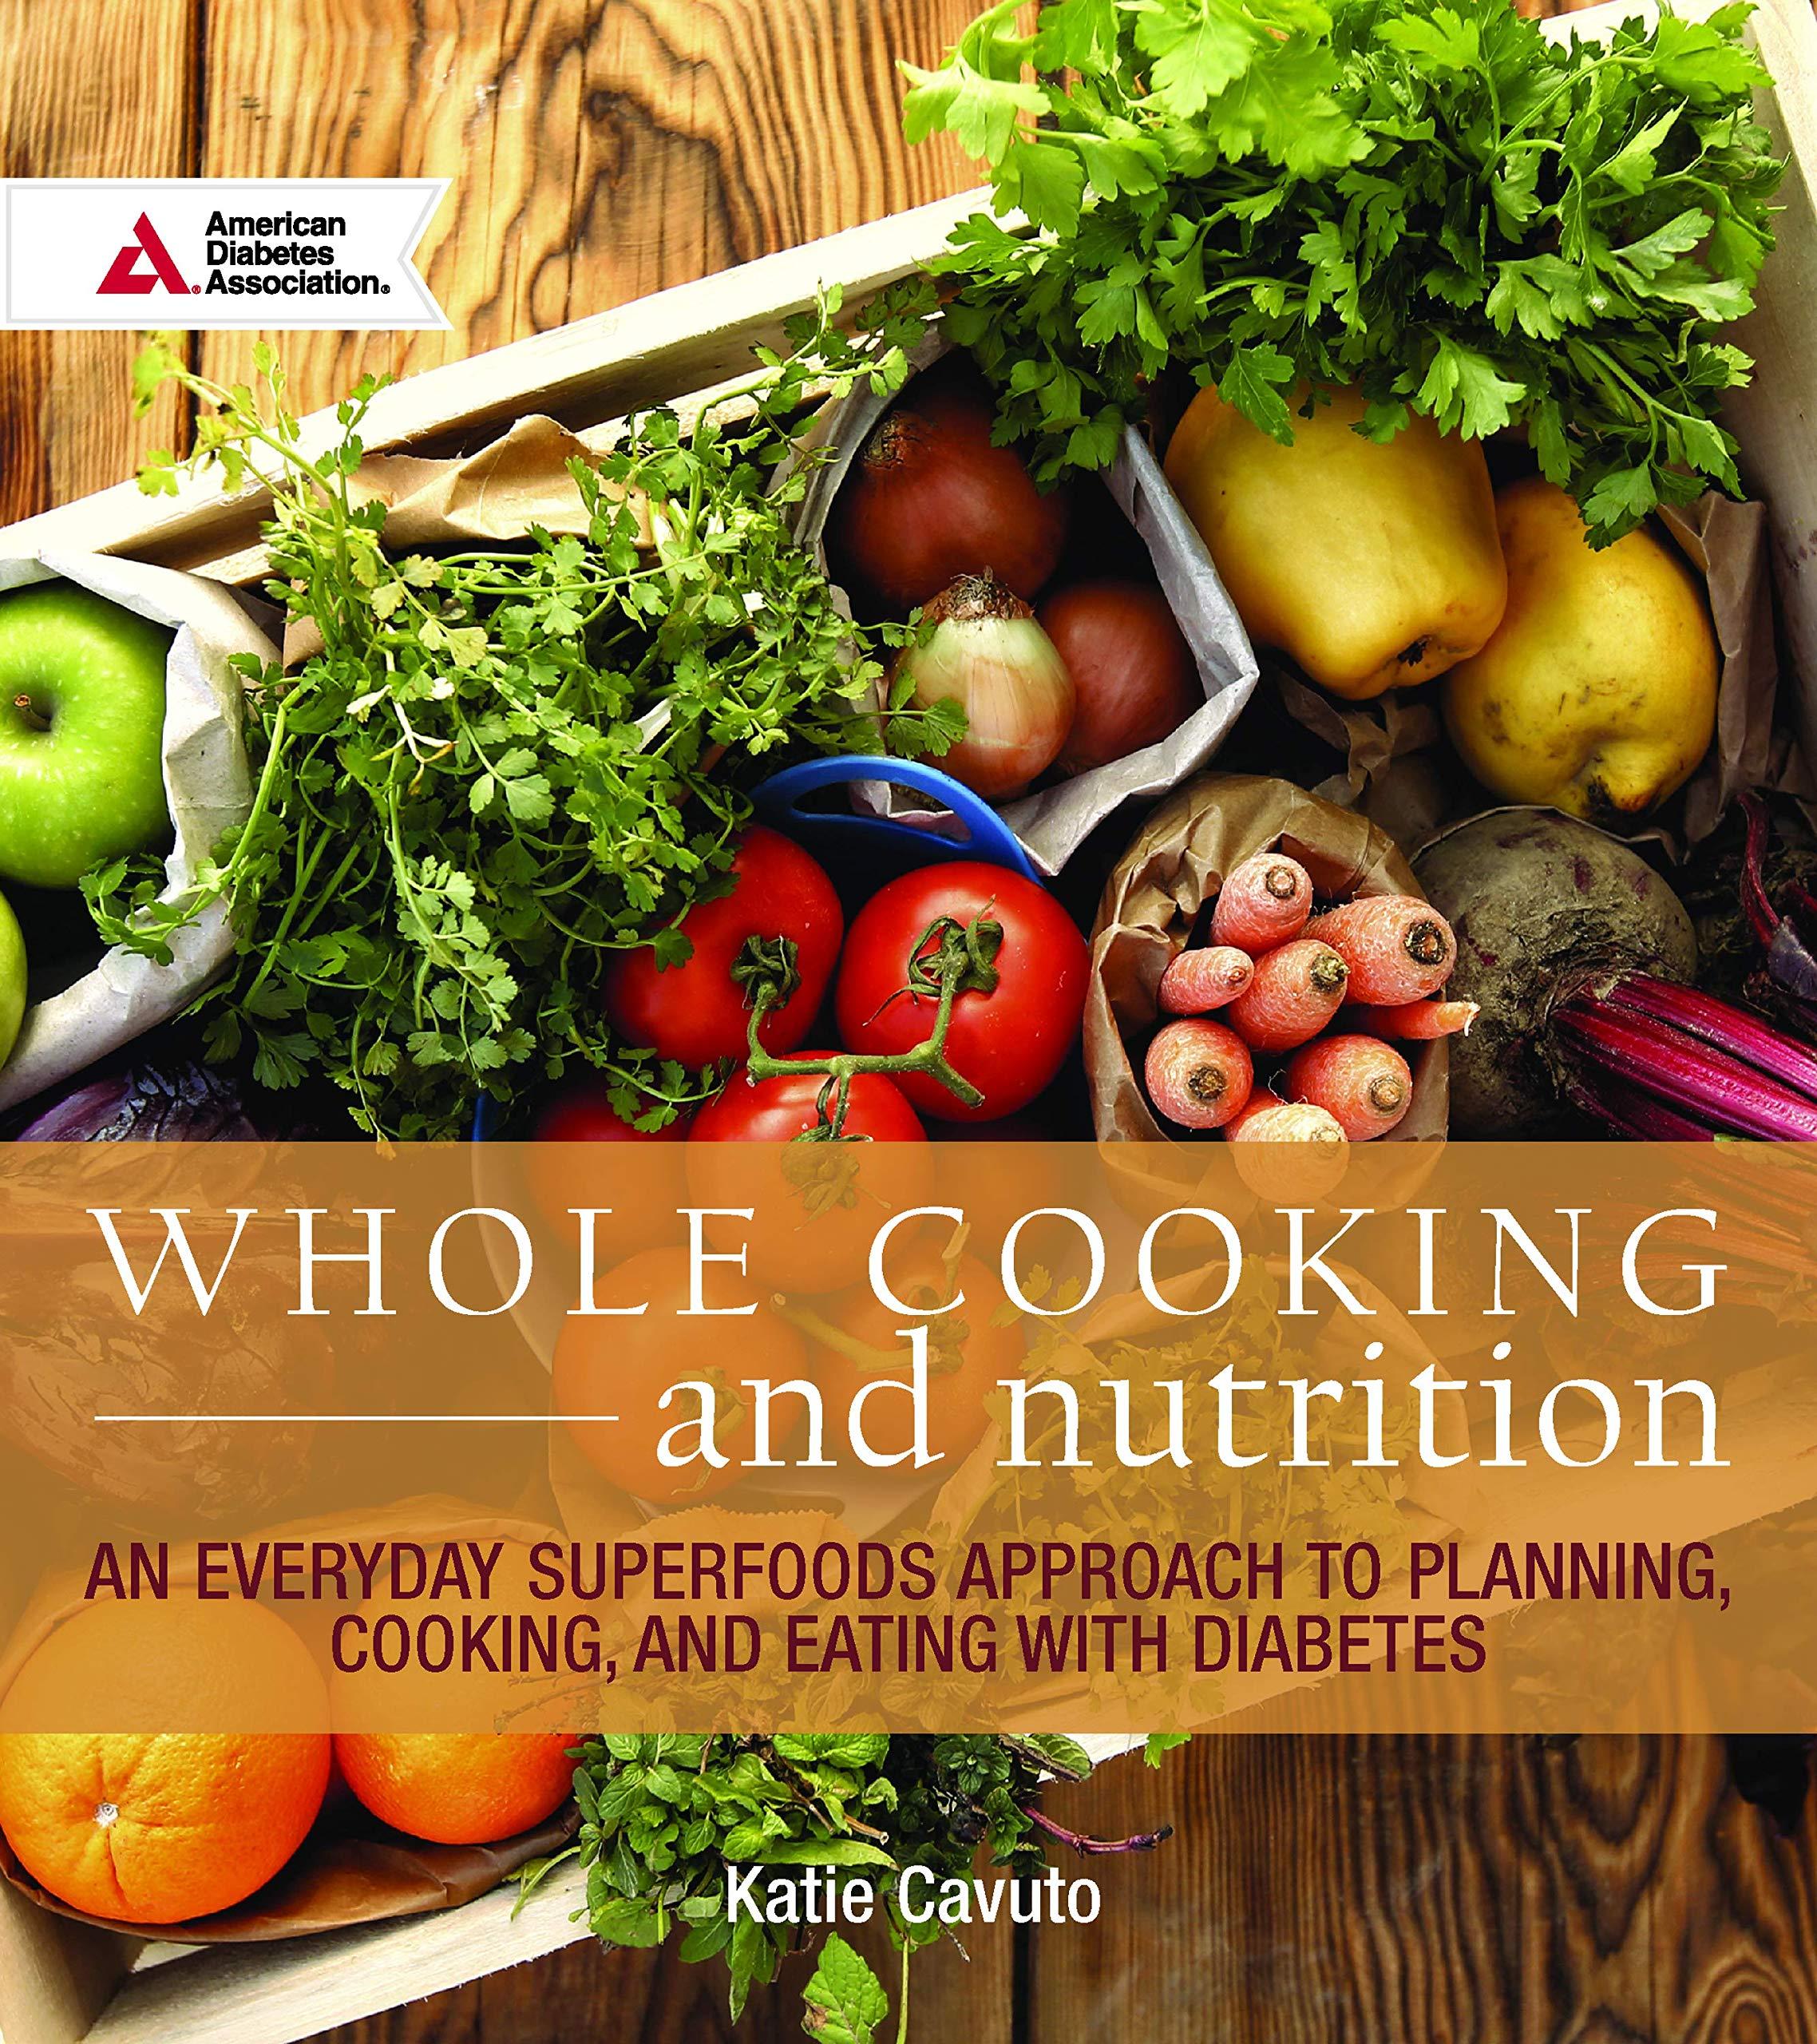 Nutritional psychiatry: Your brain on food - Harvard Health